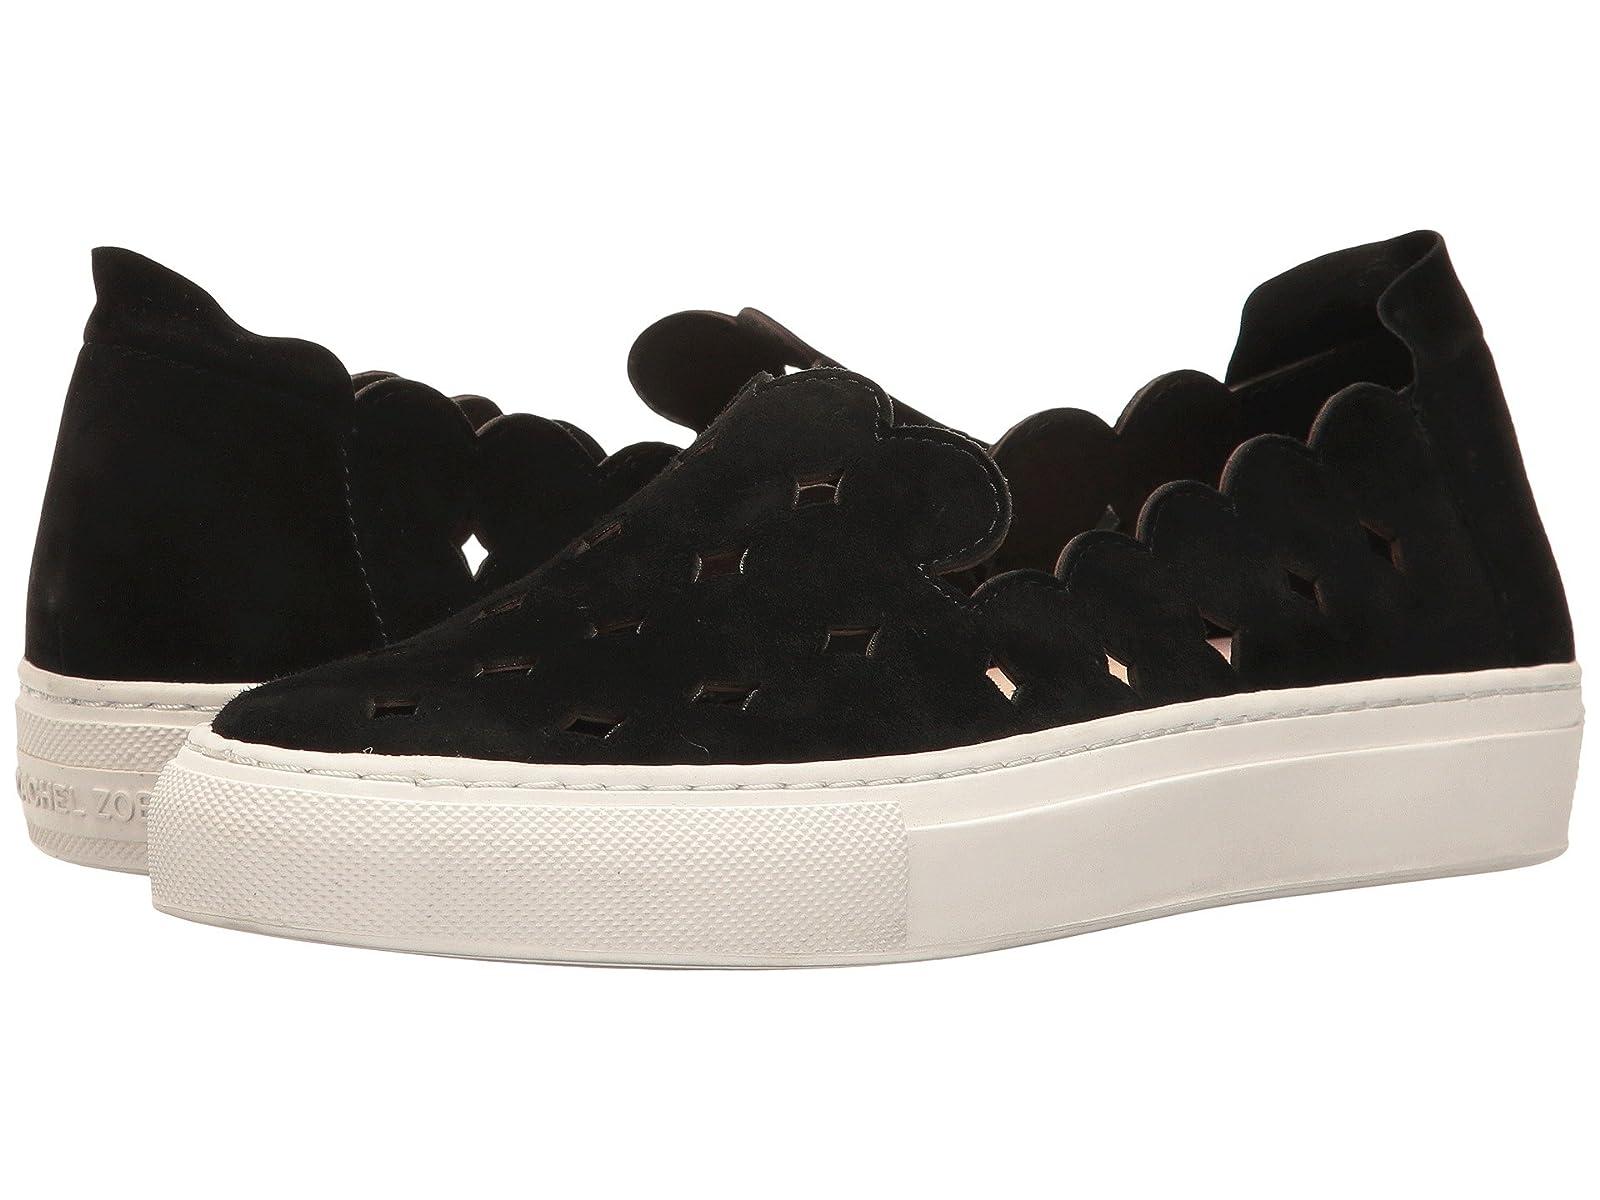 Rachel Zoe Burke CloudsCheap and distinctive eye-catching shoes